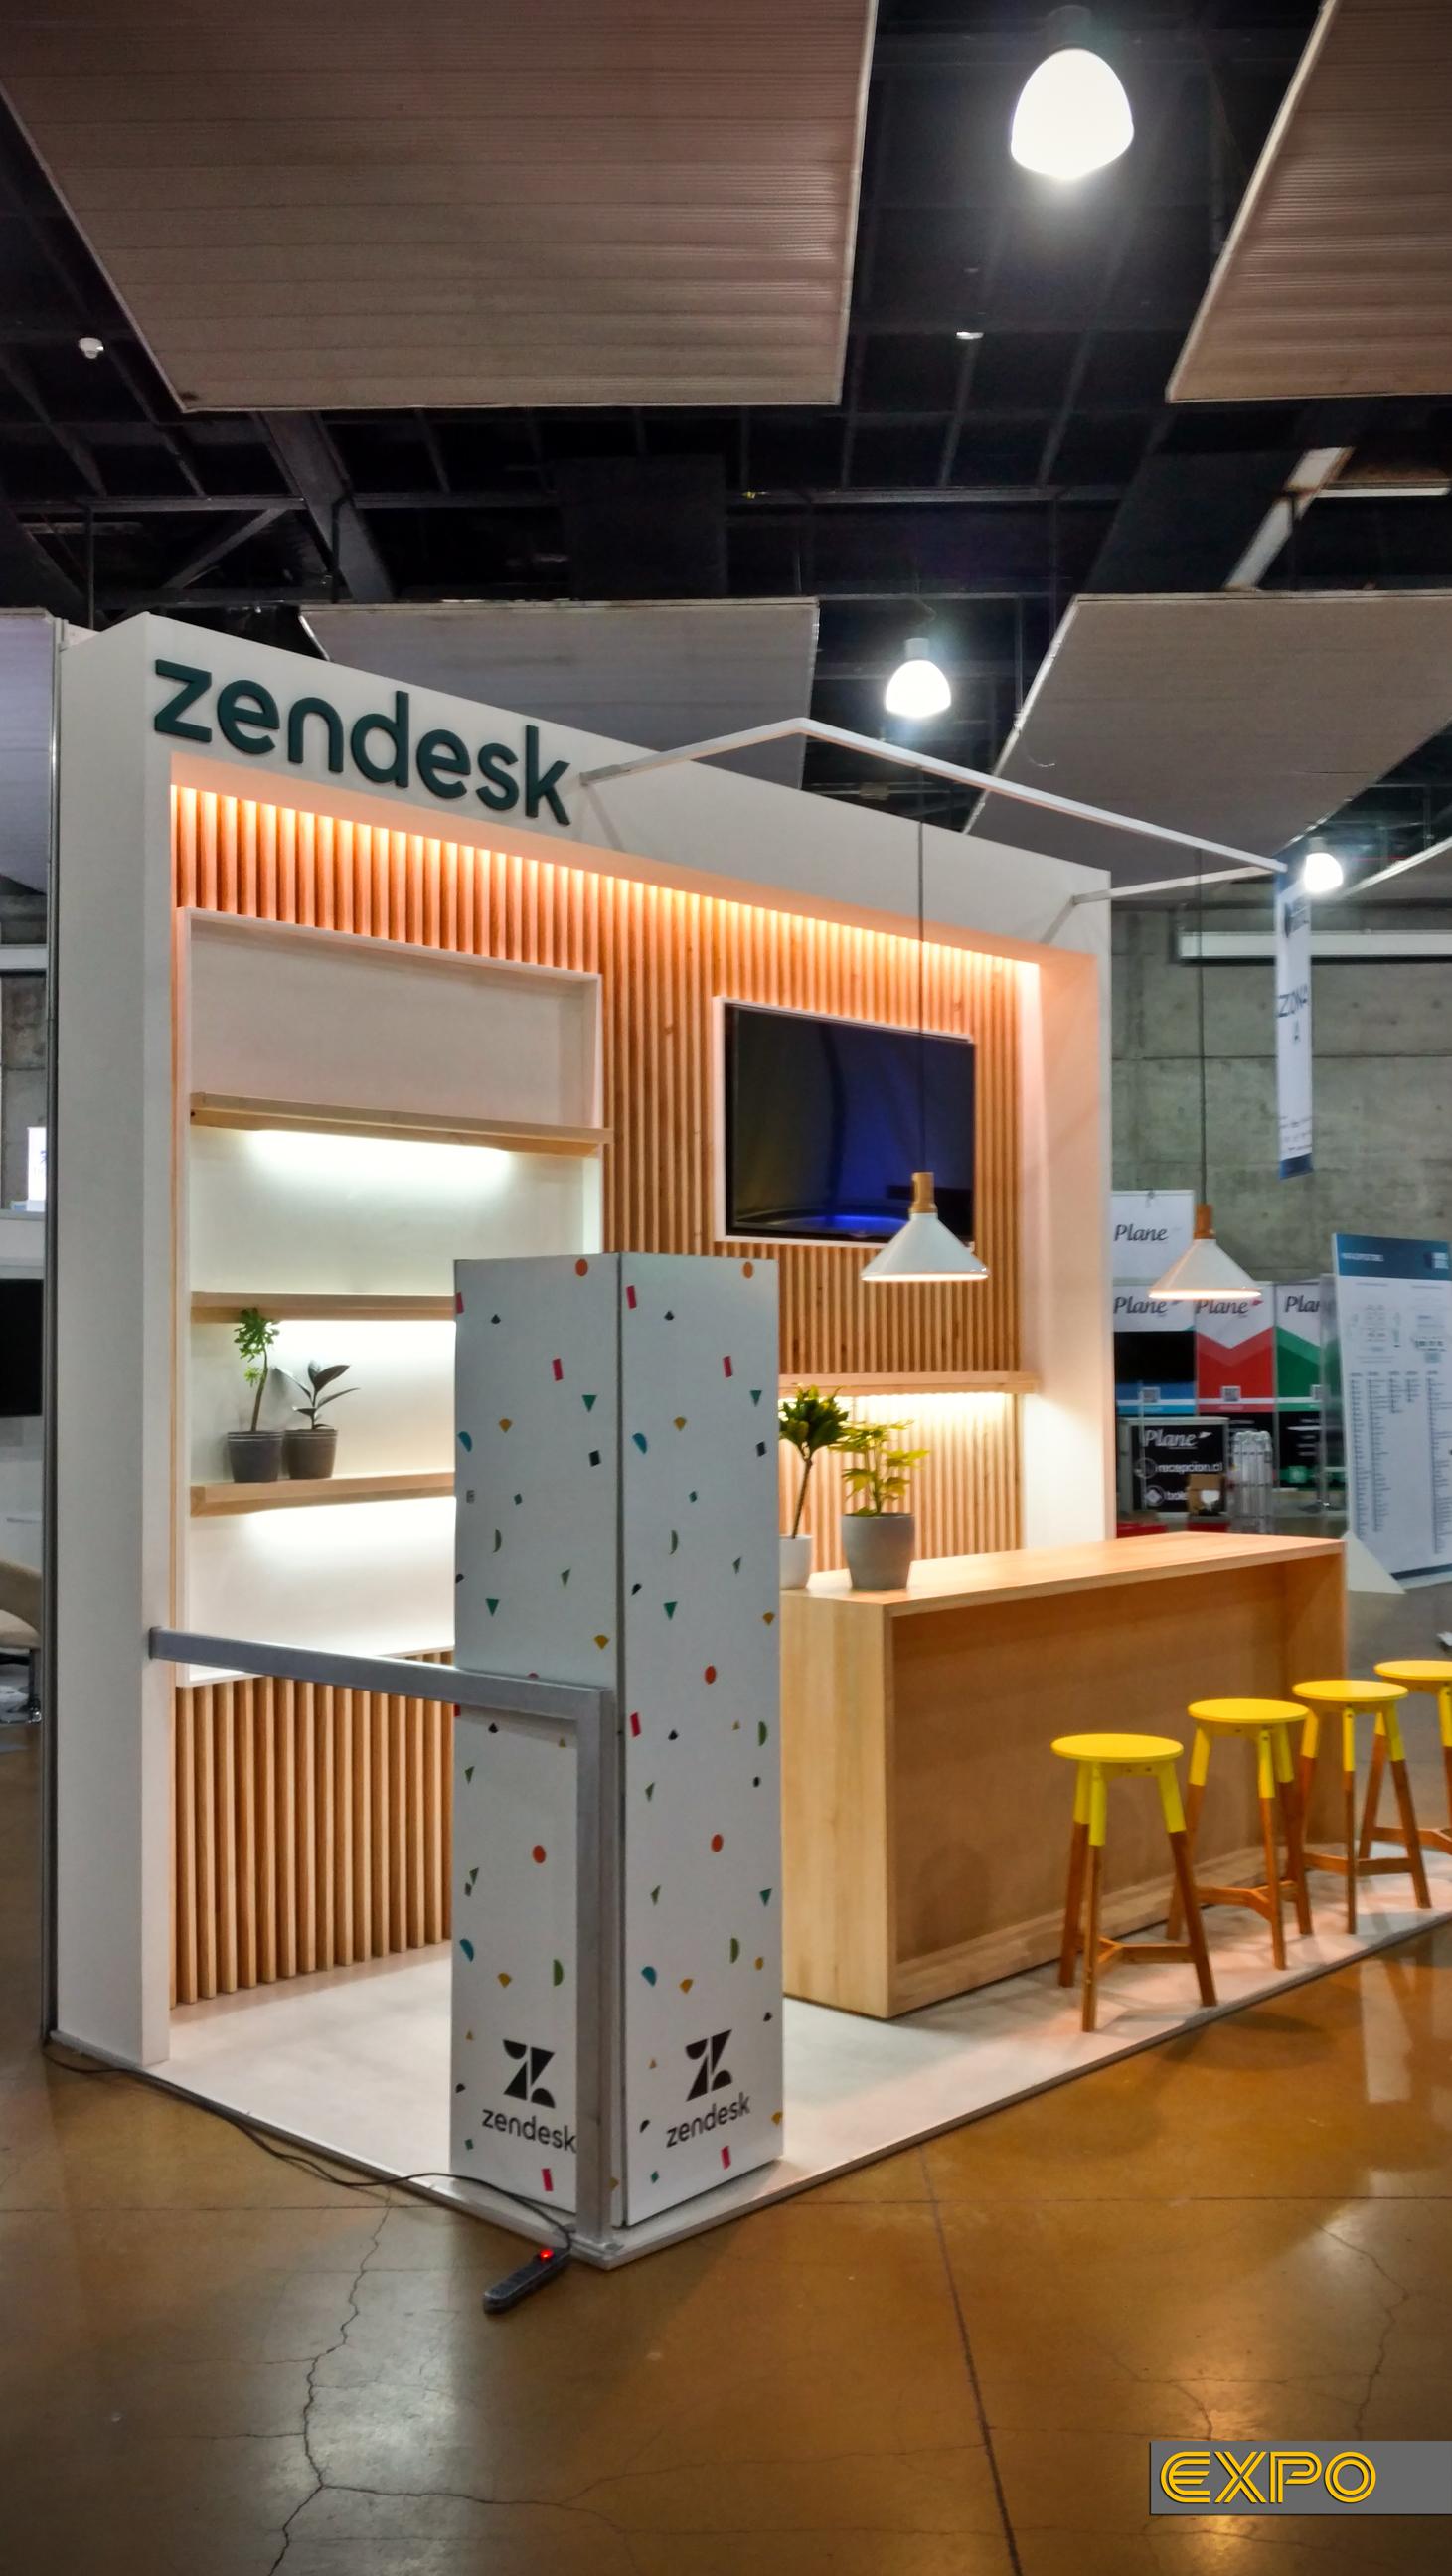 Zendesk - América Digital 2017